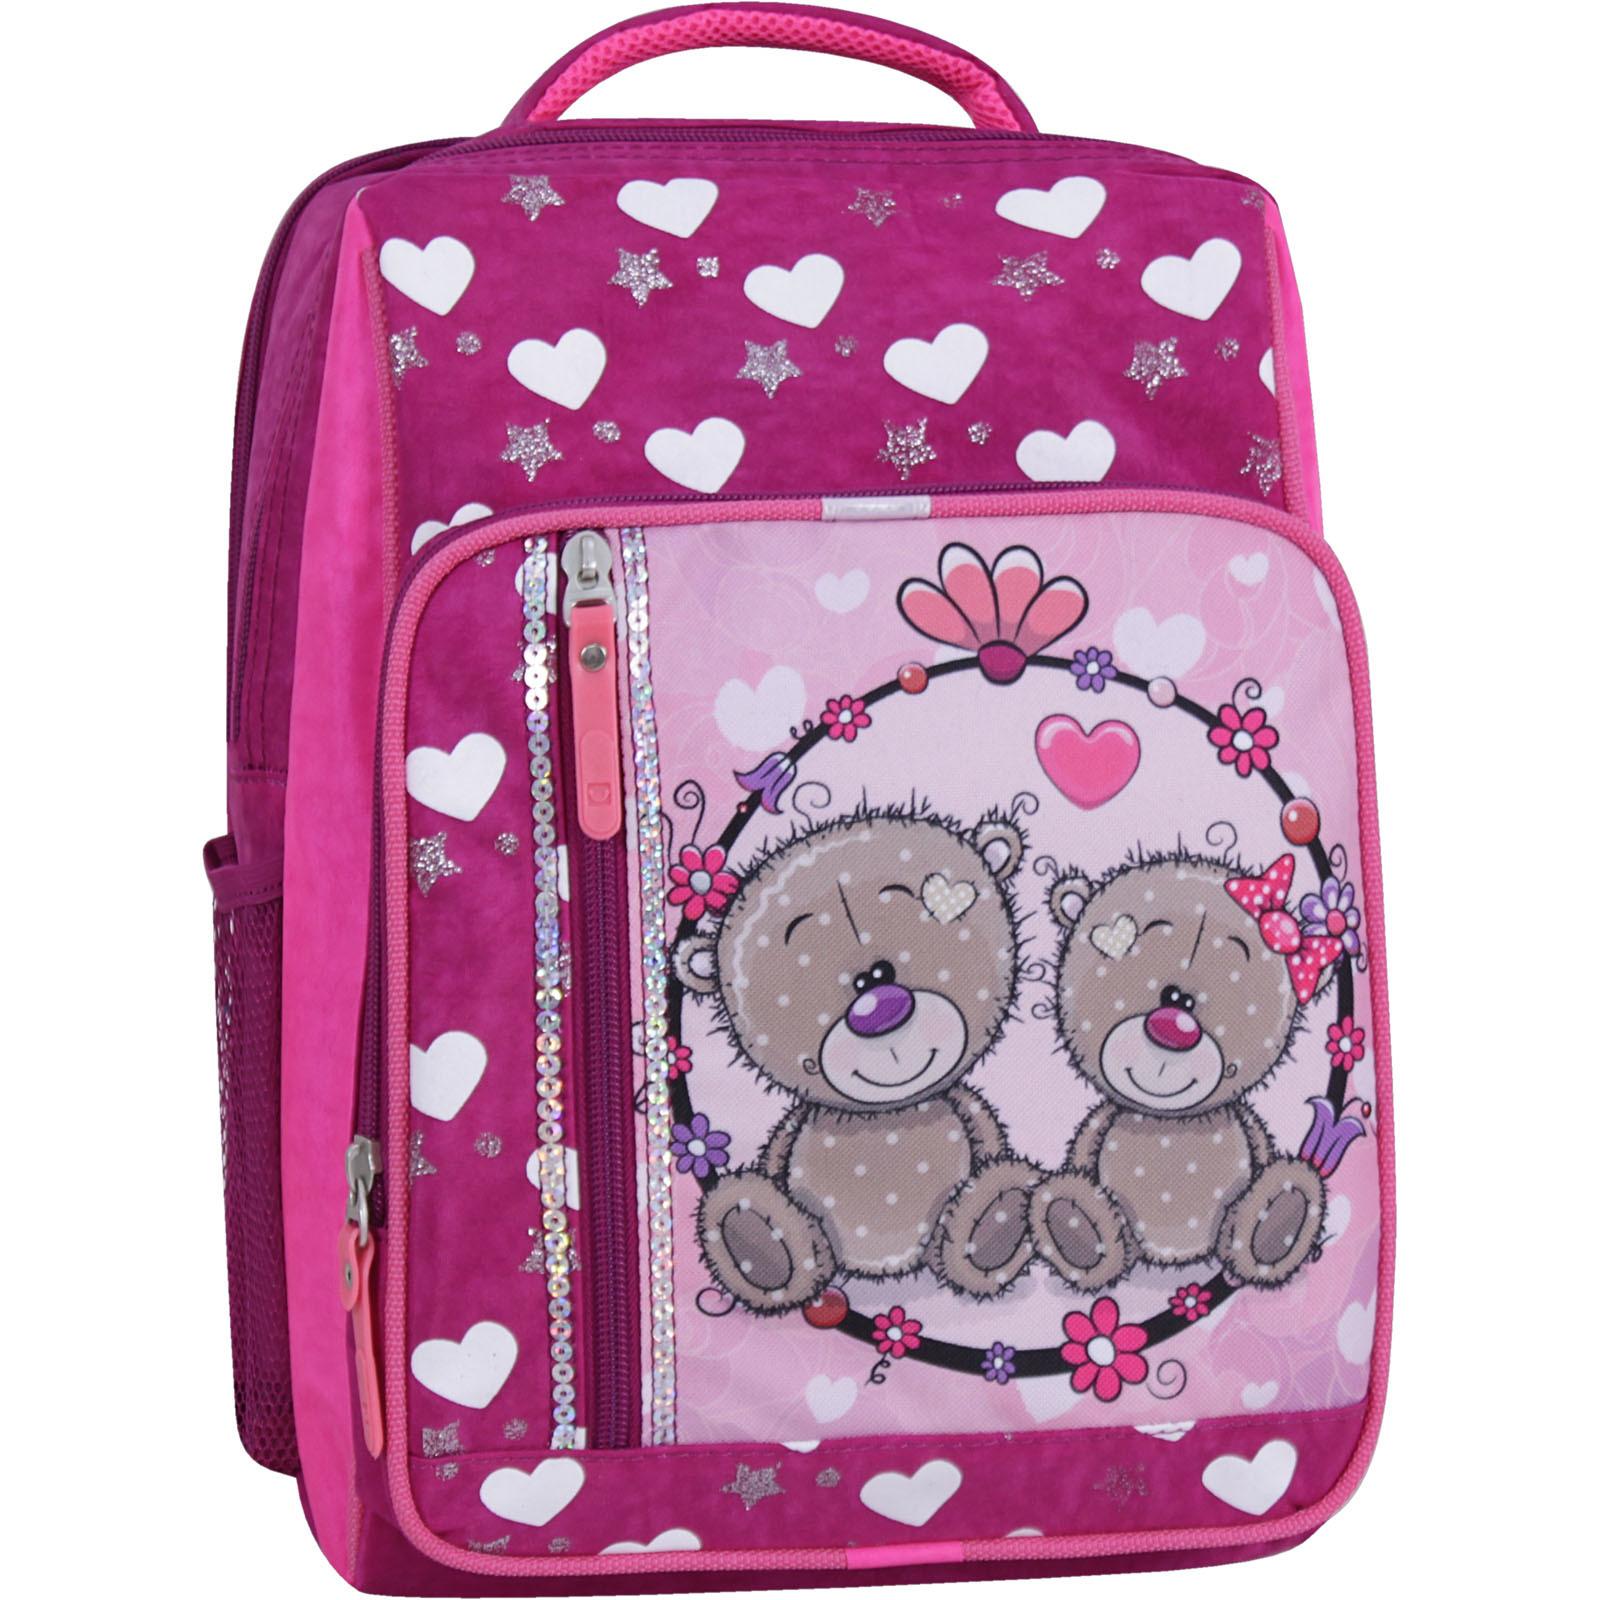 Школьные рюкзаки Рюкзак школьный Bagland Школьник 8 л. 143 малиновый 686 (0012870) IMG_2721_суб.686_-1600.JPG